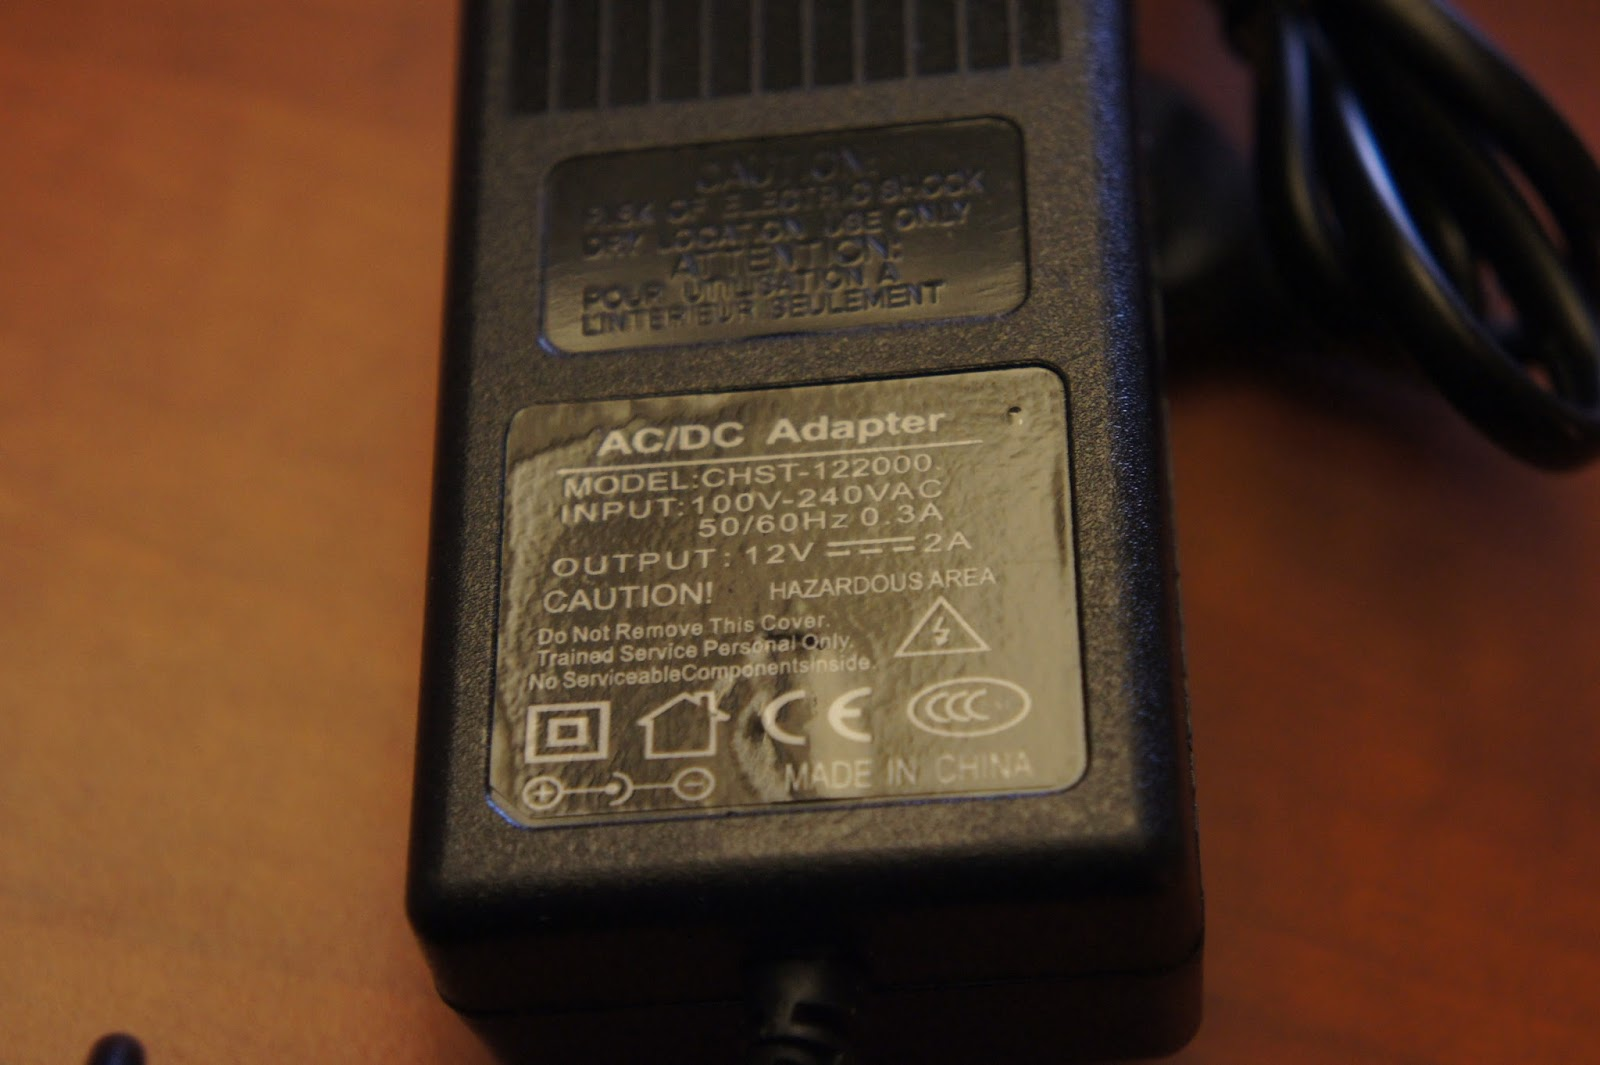 DSC09500-1.jpg